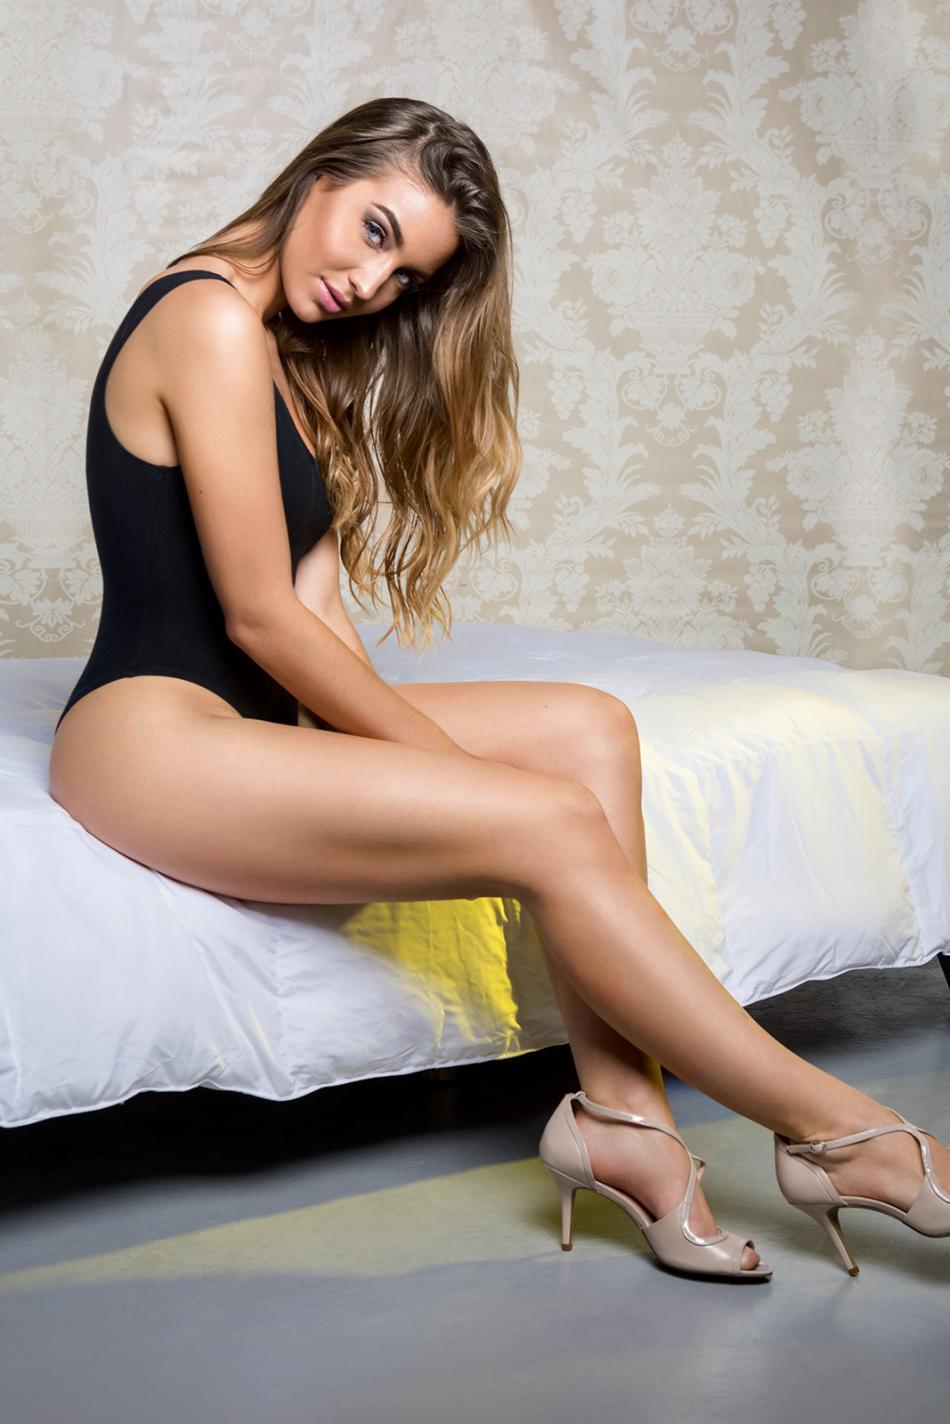 Ladyfordaddy.com ANNA Escort Girl In New York 24080516 - 7 7